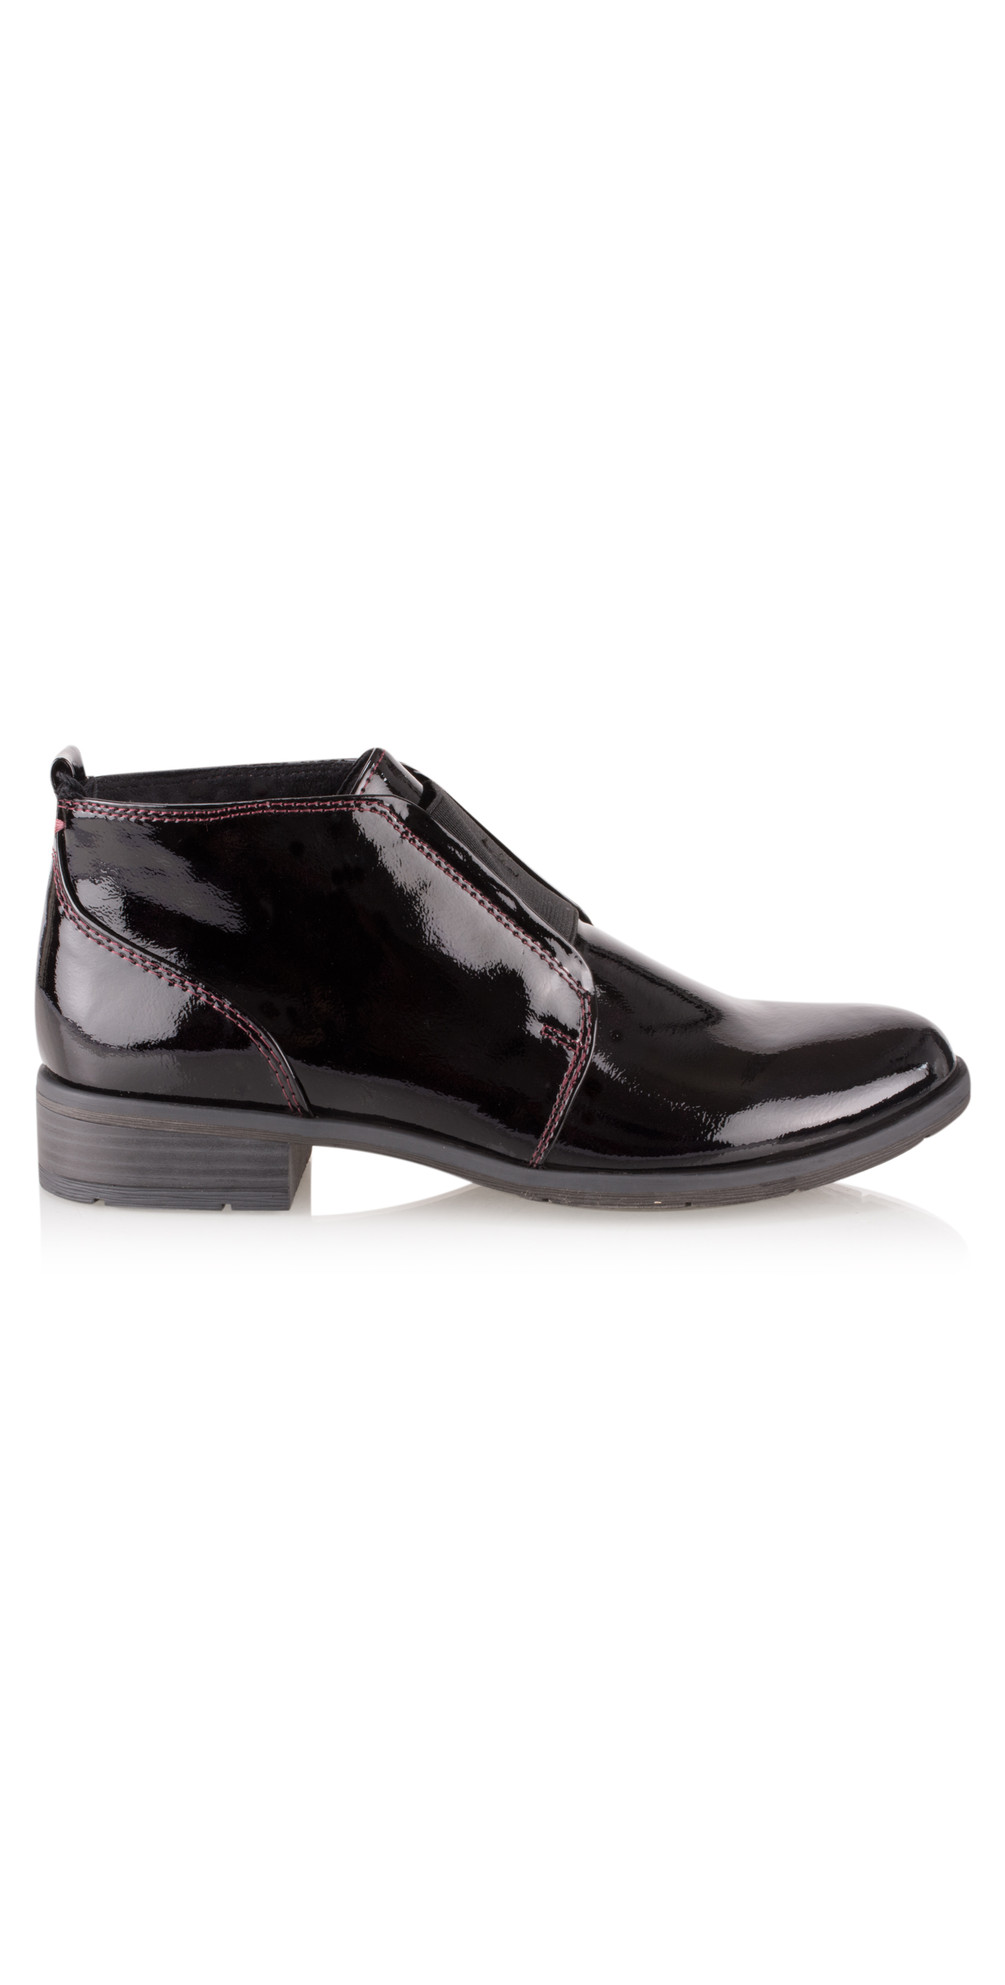 marco tozzi patent shoe boot in merlot